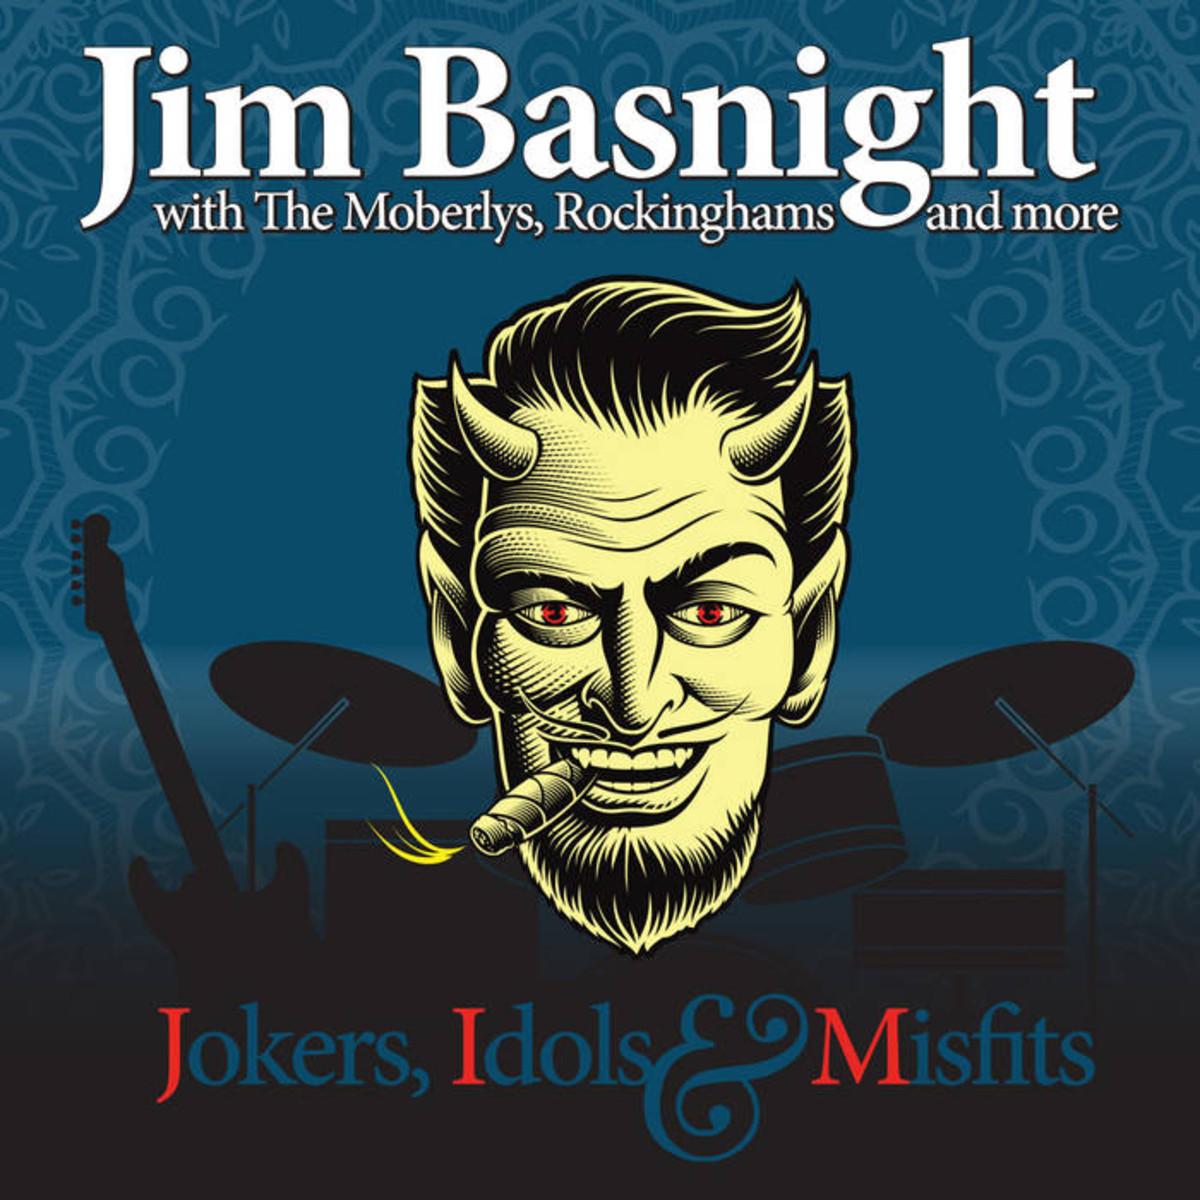 Jim Basnight Jokers Idols & Misfits